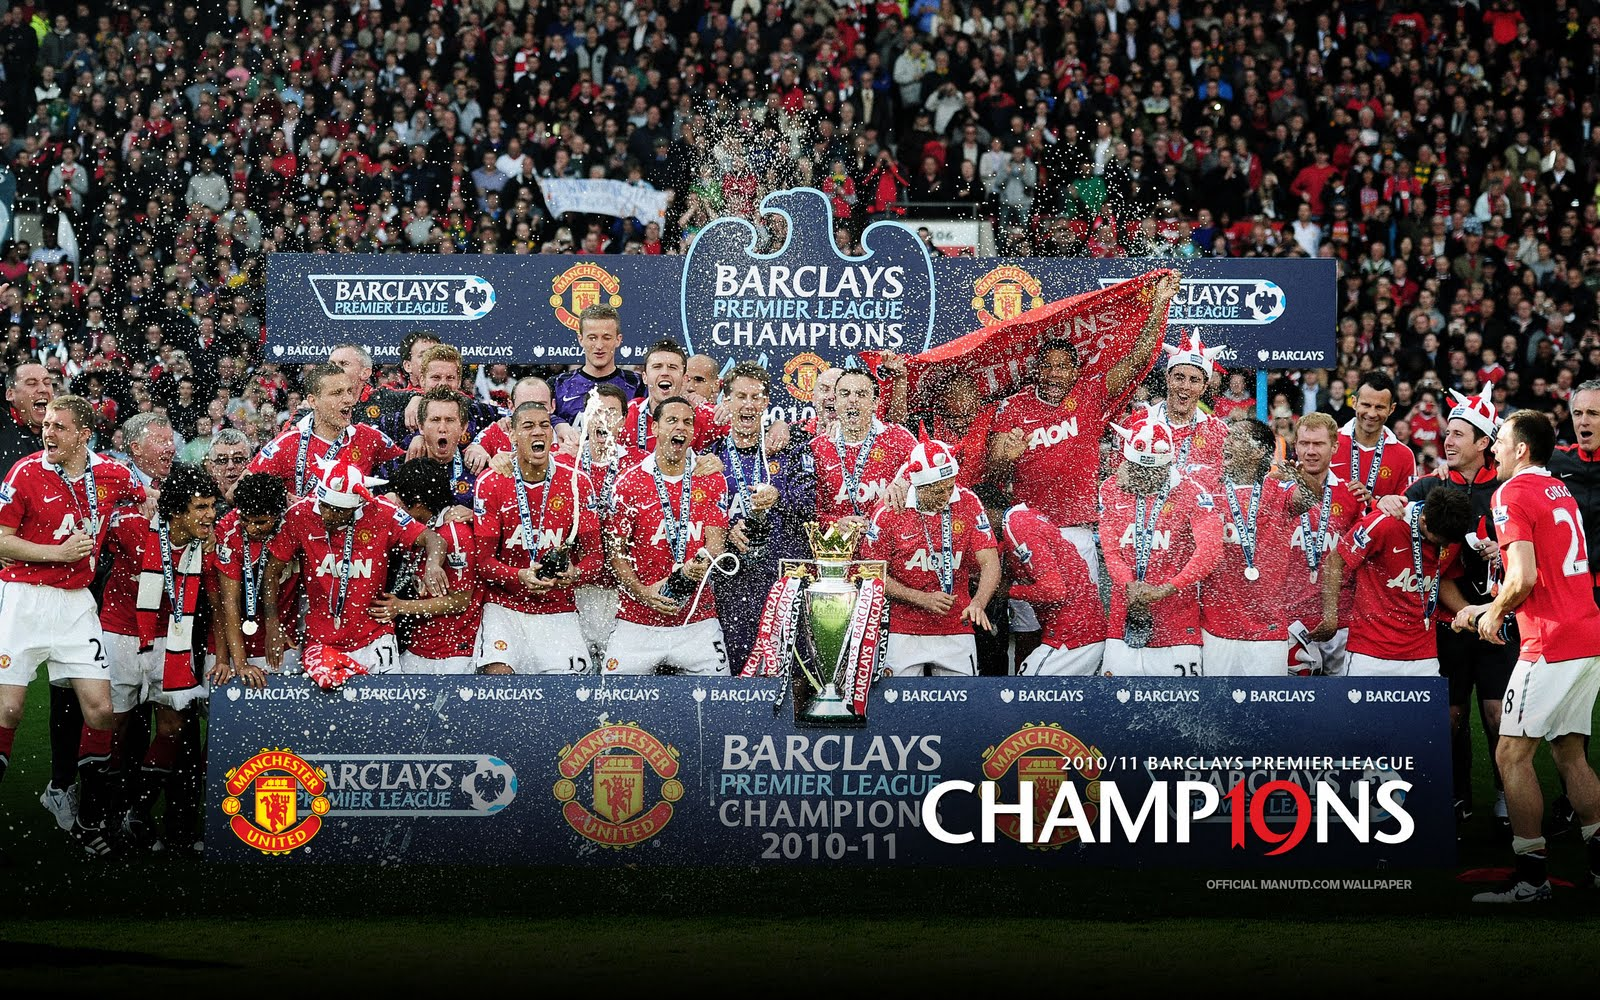 http://3.bp.blogspot.com/-_9qvG9WnkLY/Tdlu9bHS_RI/AAAAAAAAAUw/q2YovJ56XAI/s1600/Champions19-Trophy-4.jpg